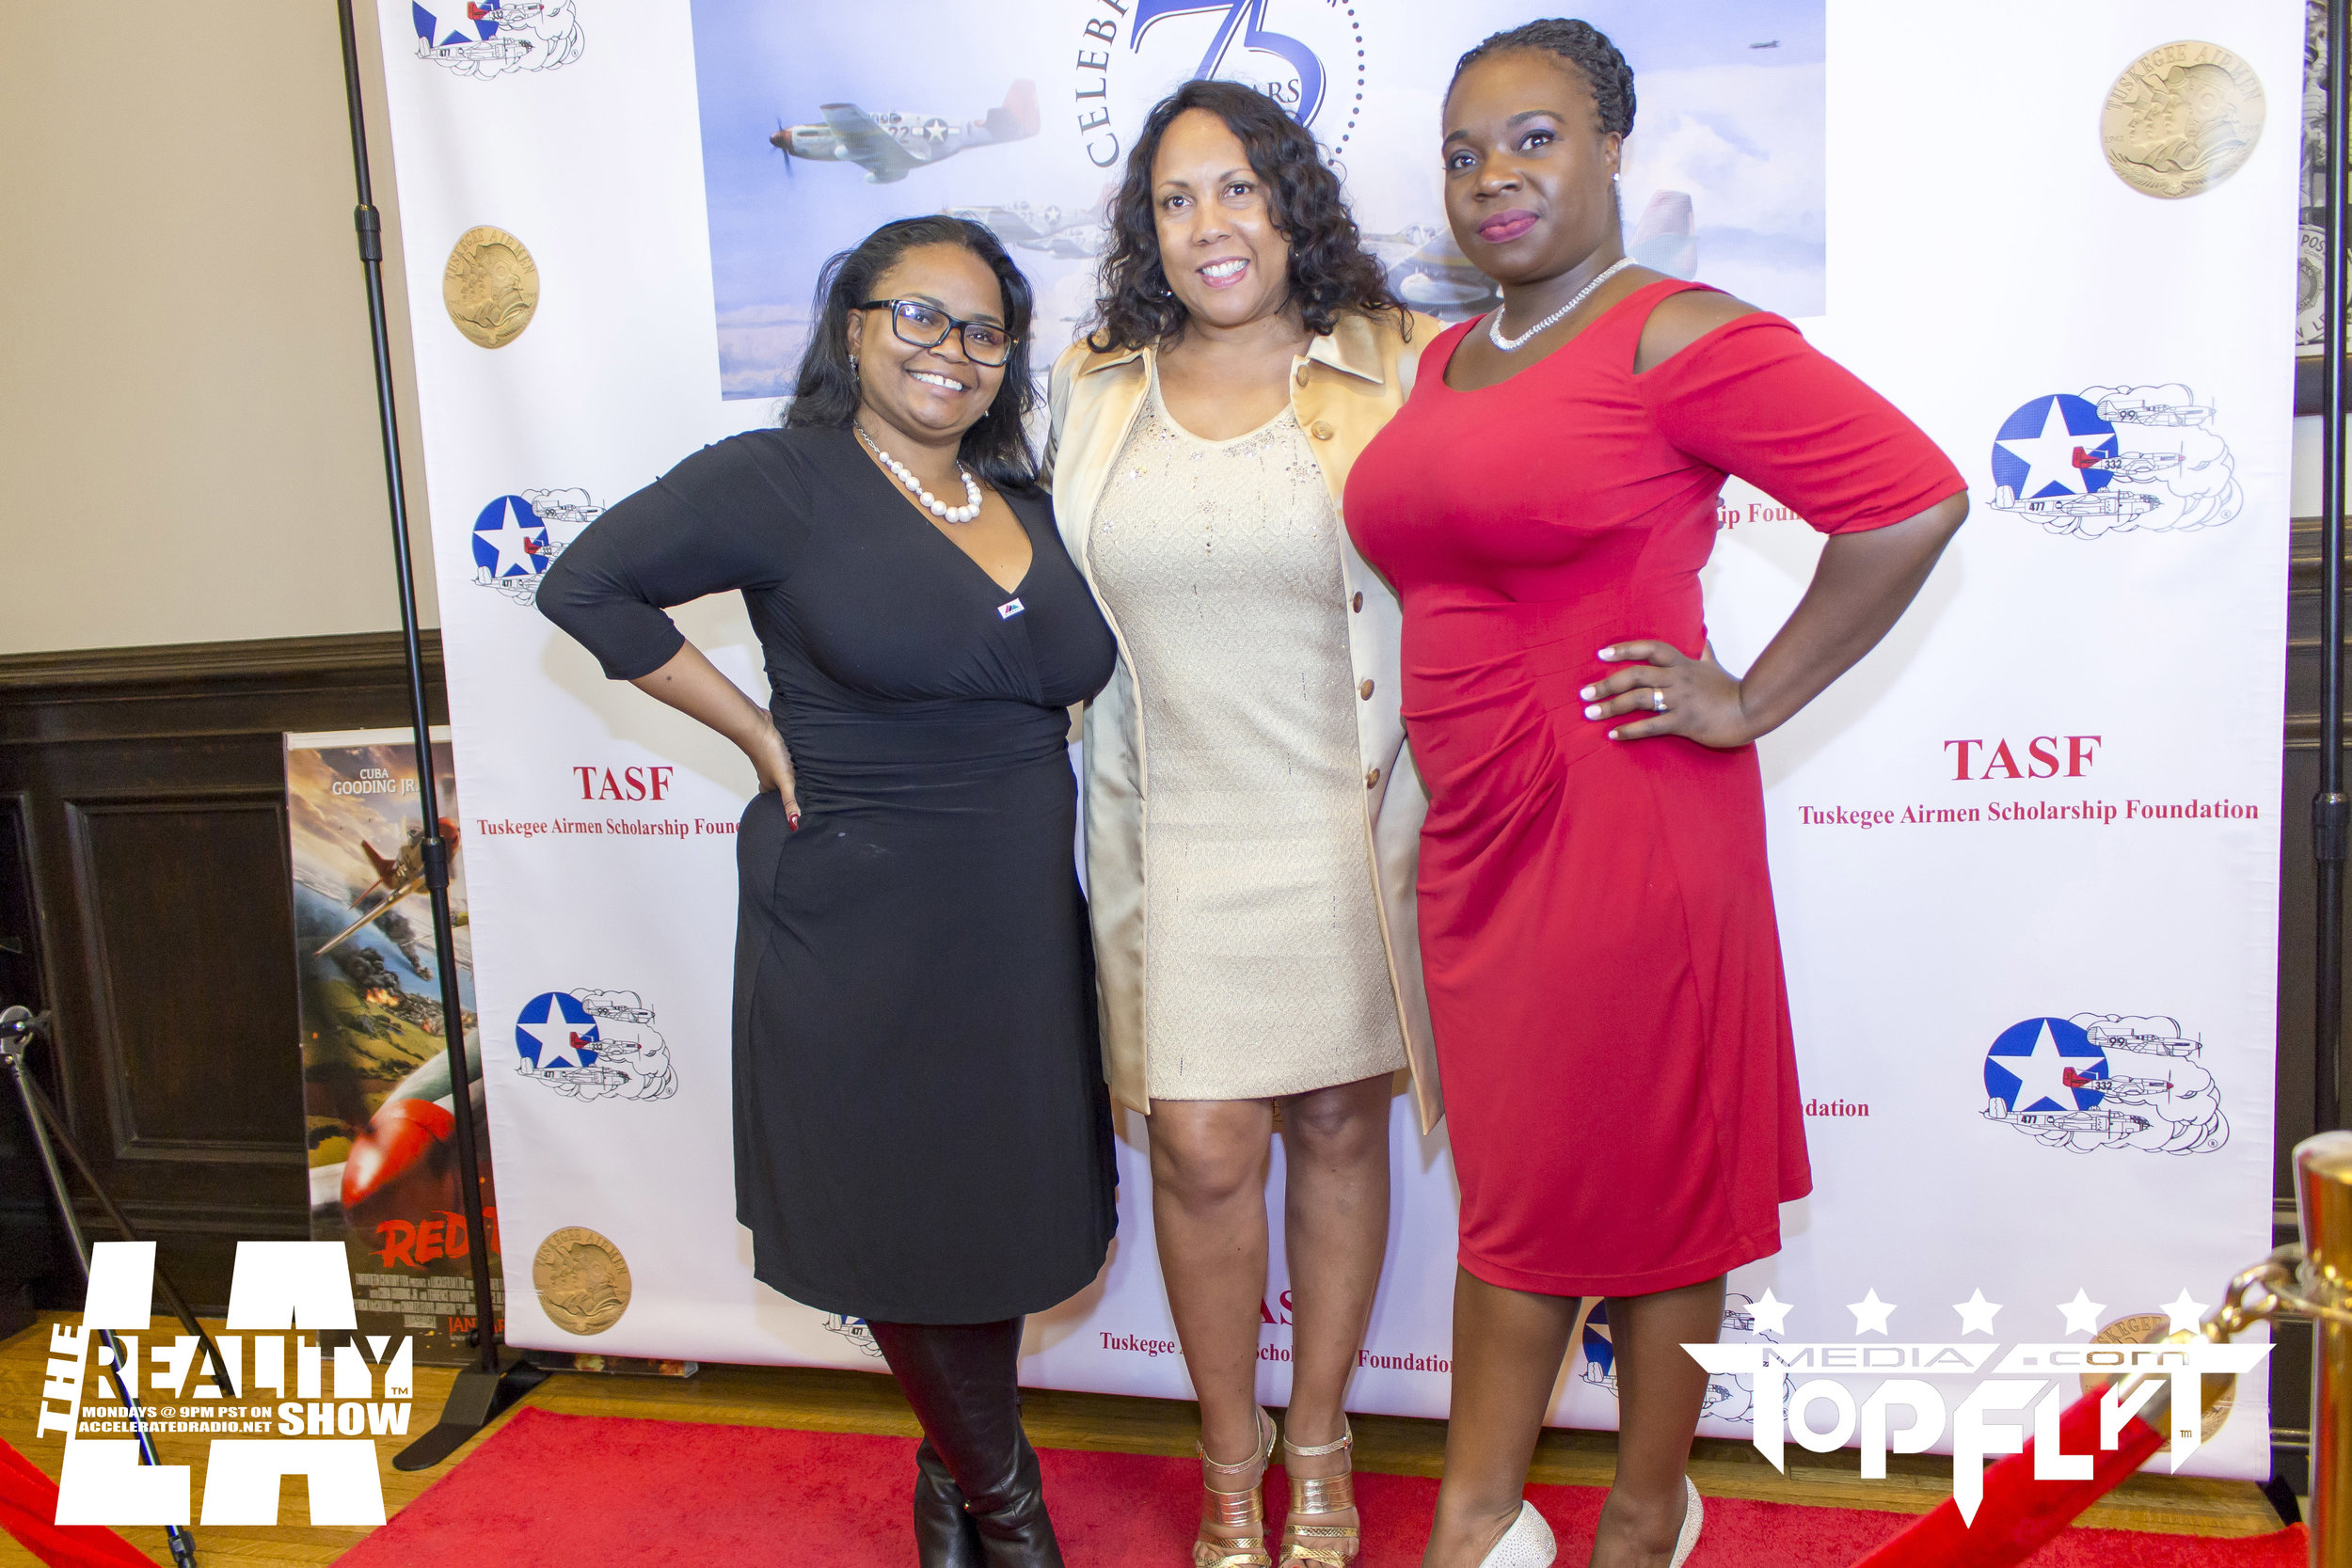 The Reality Show LA - Tuskegee Airmen 75th Anniversary VIP Reception_94.jpg